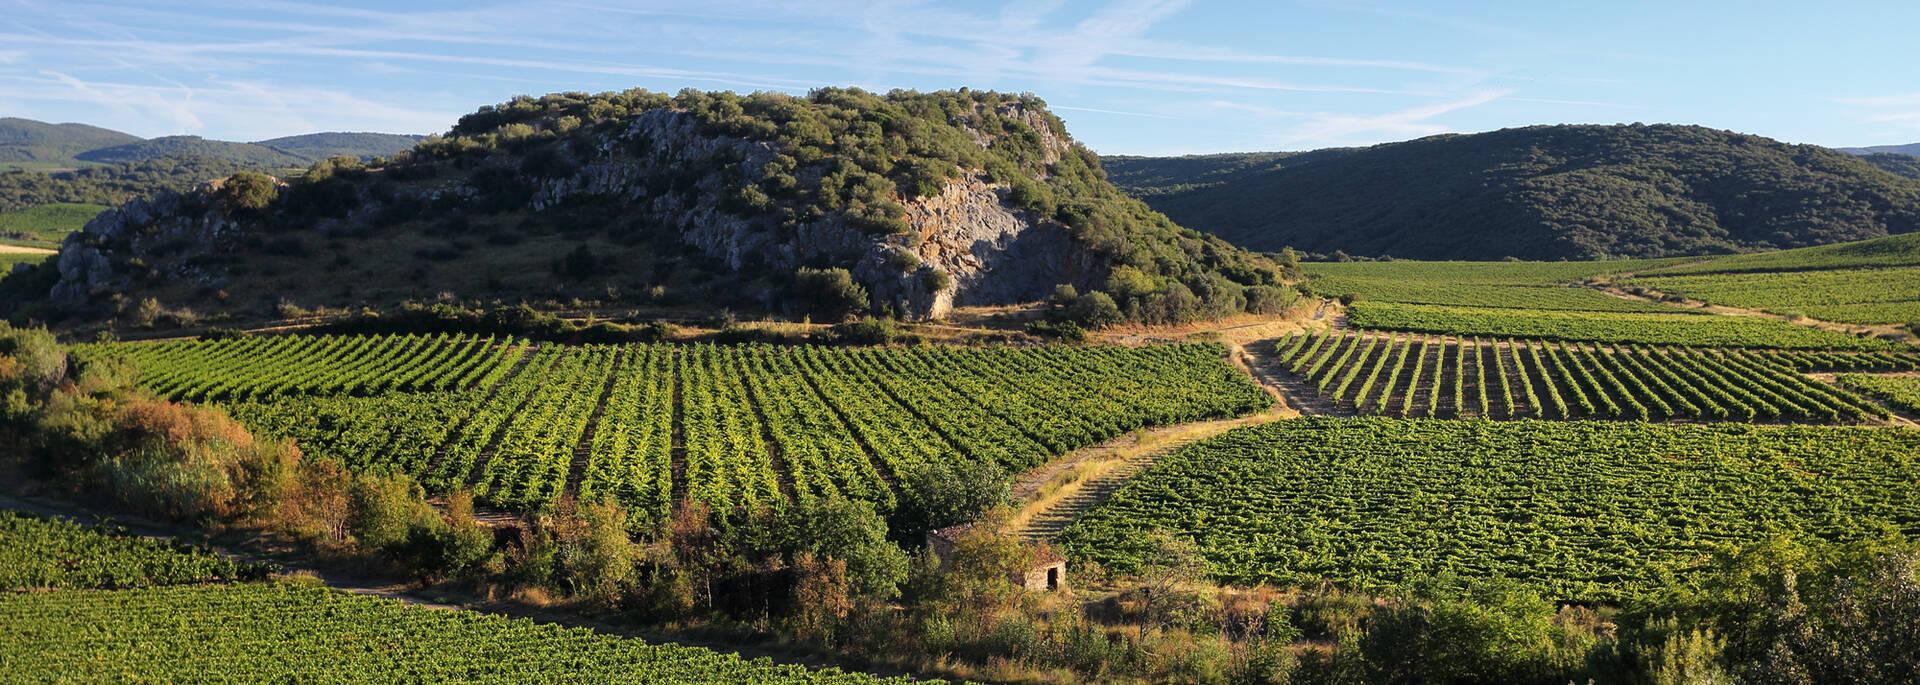 Vineyards in the Haut Languedoc et Vignobles